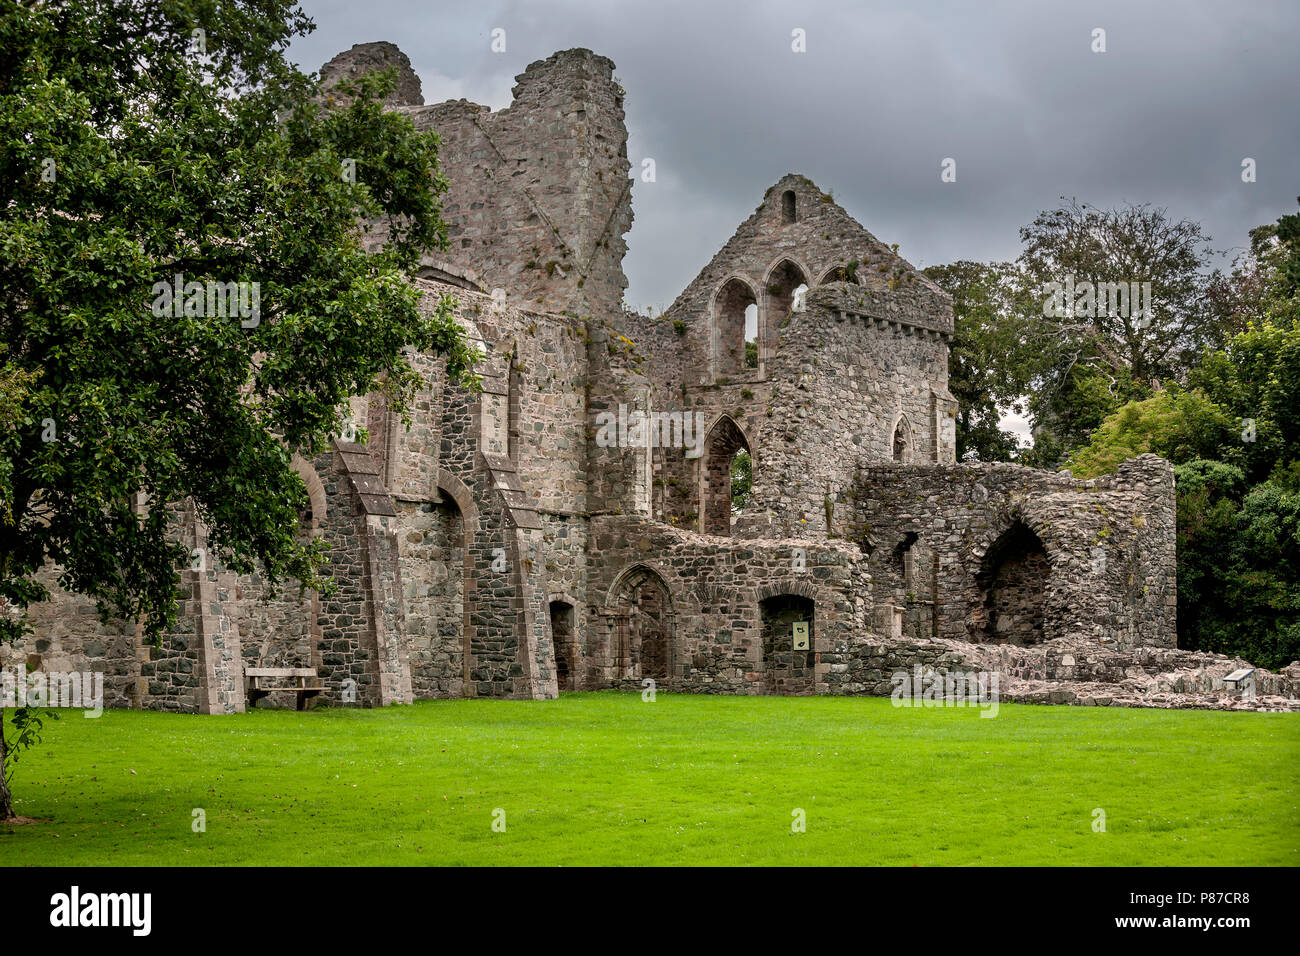 Grey Abbey Cistercian monastery on Strangford Lough, County Down Northern Ireland - Stock Image